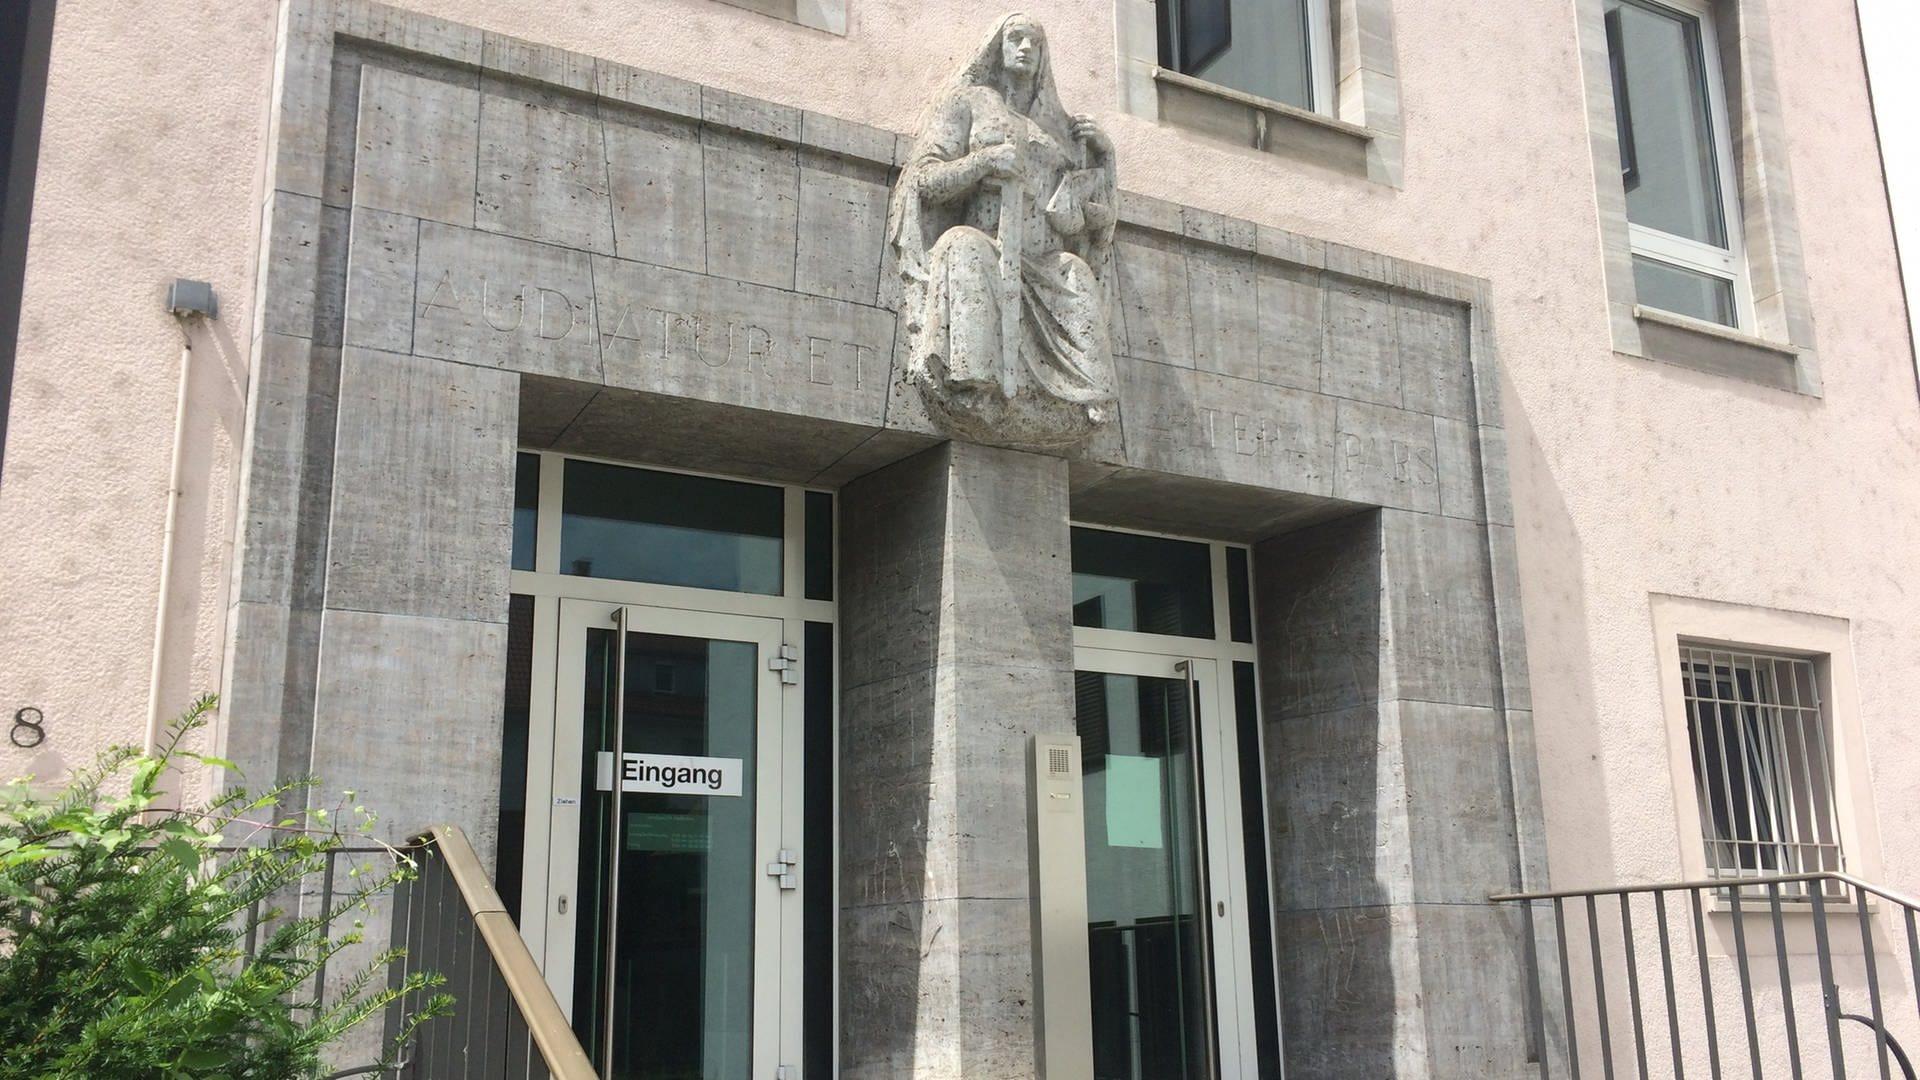 Der Eingang des Landgerichts Heilbronn